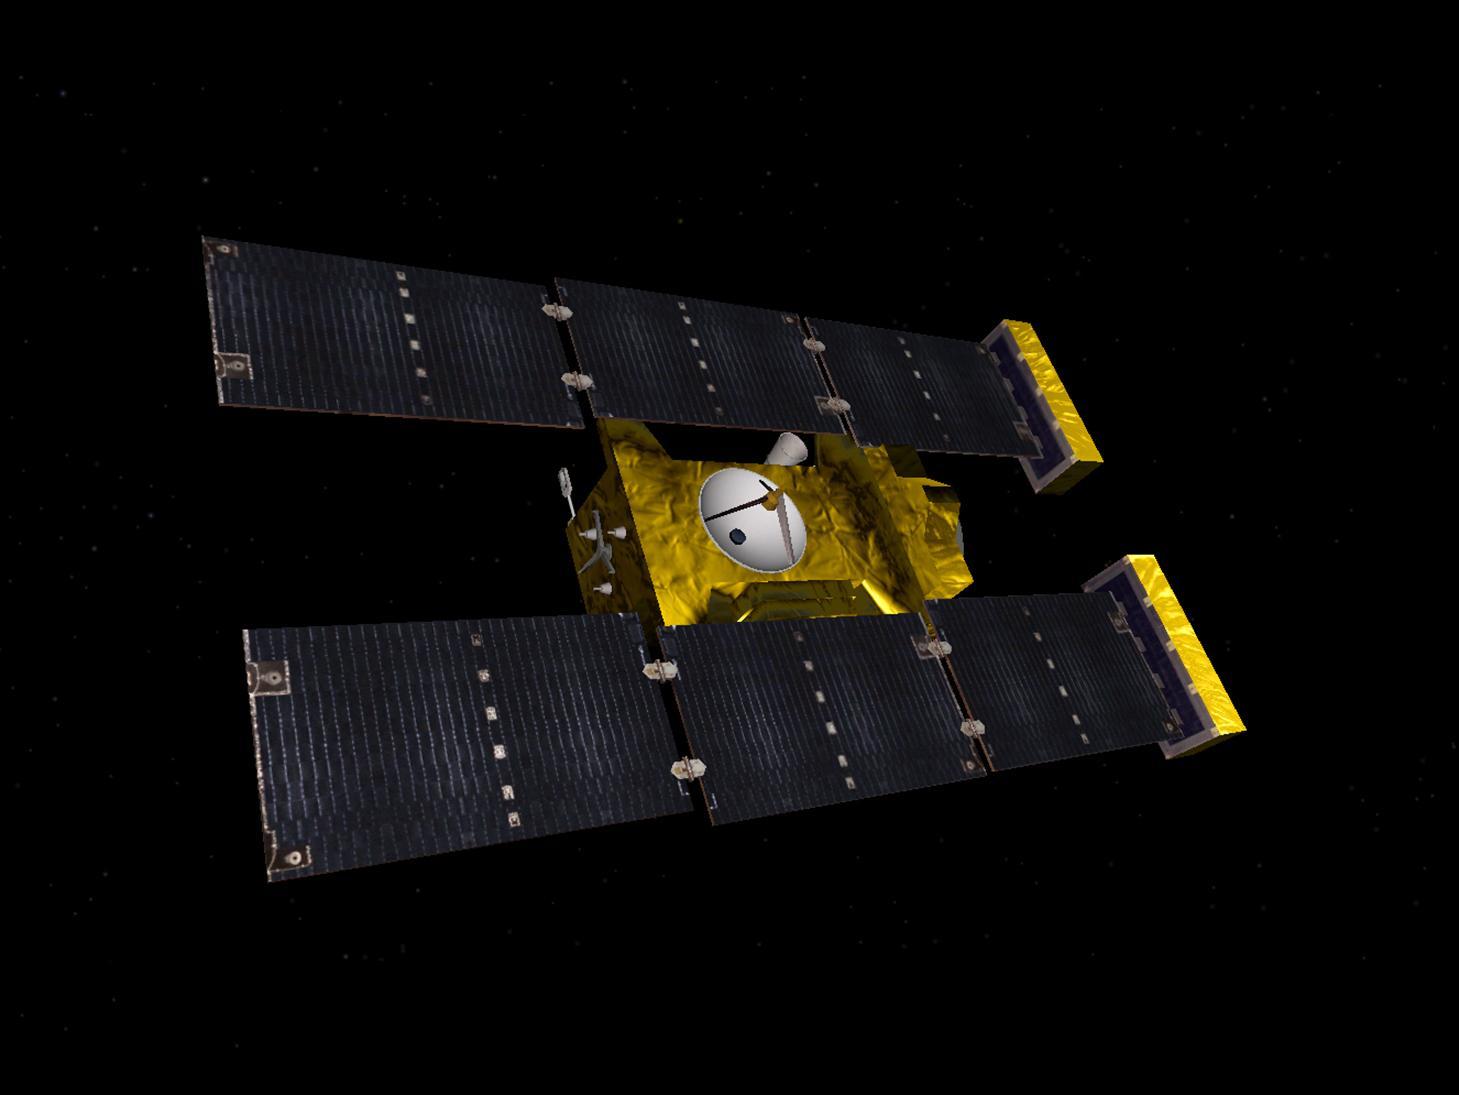 NASA - Stardust-NExT